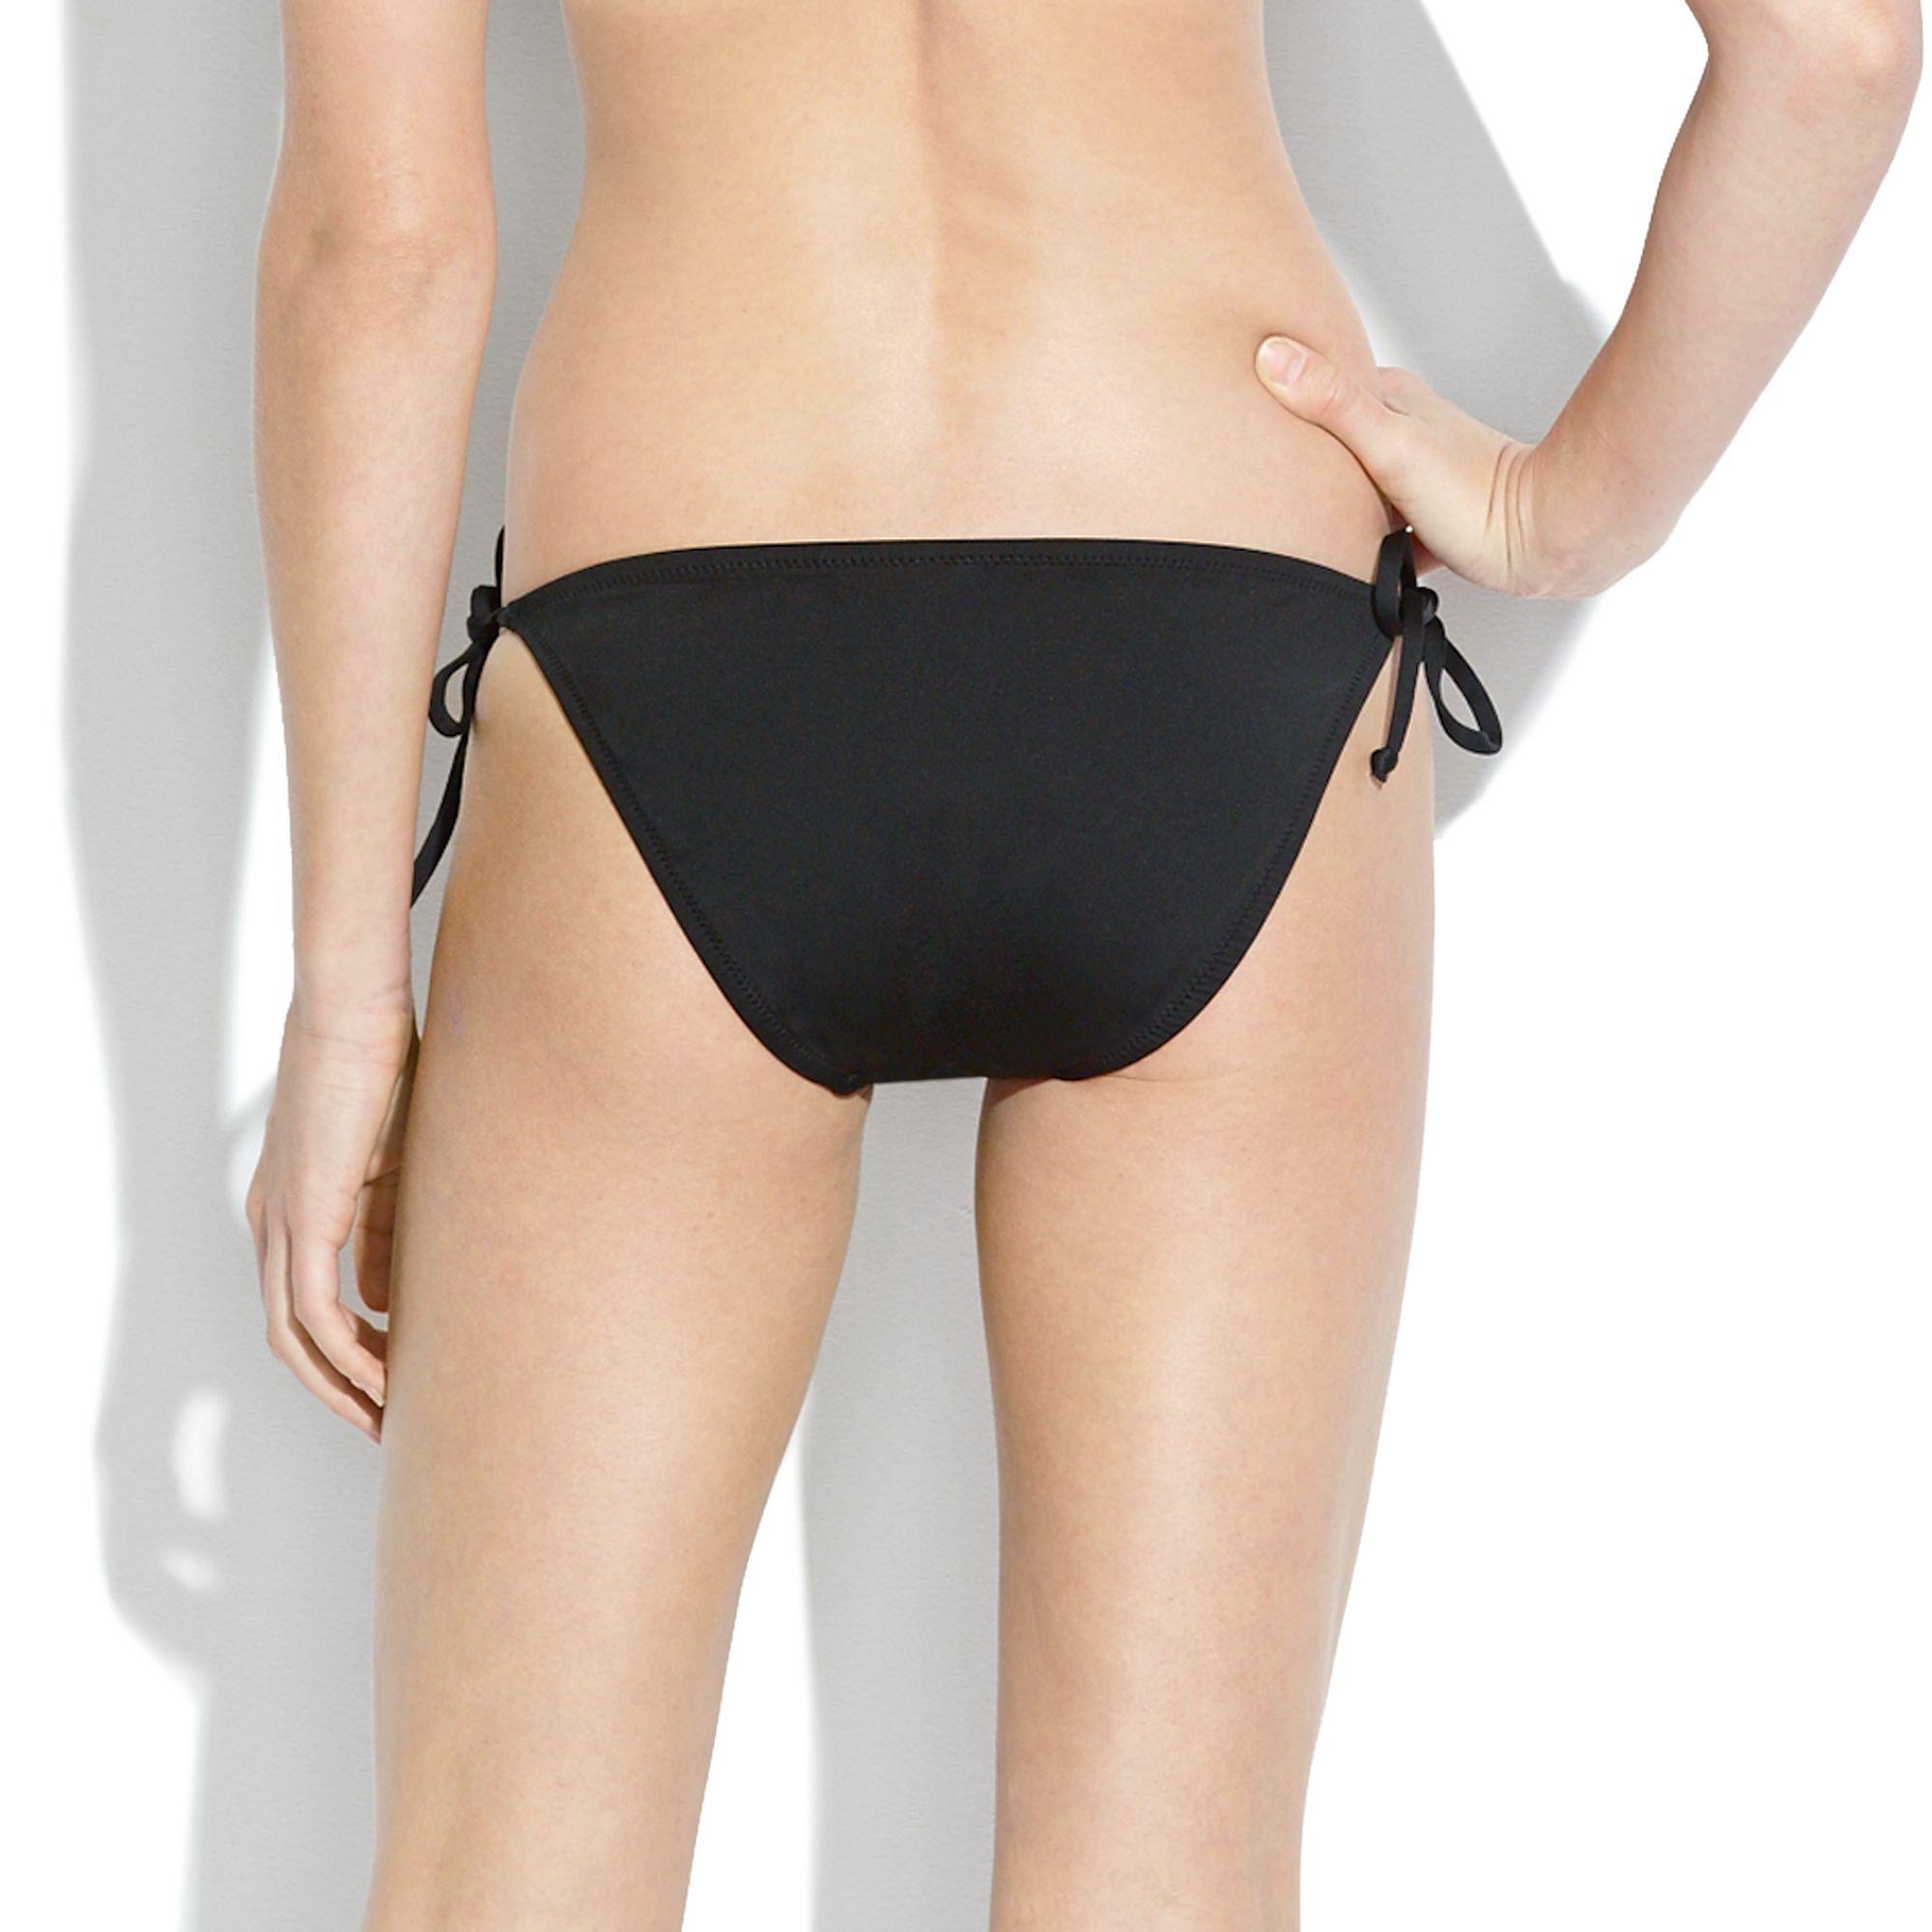 black string bikini bottoms - photo #22